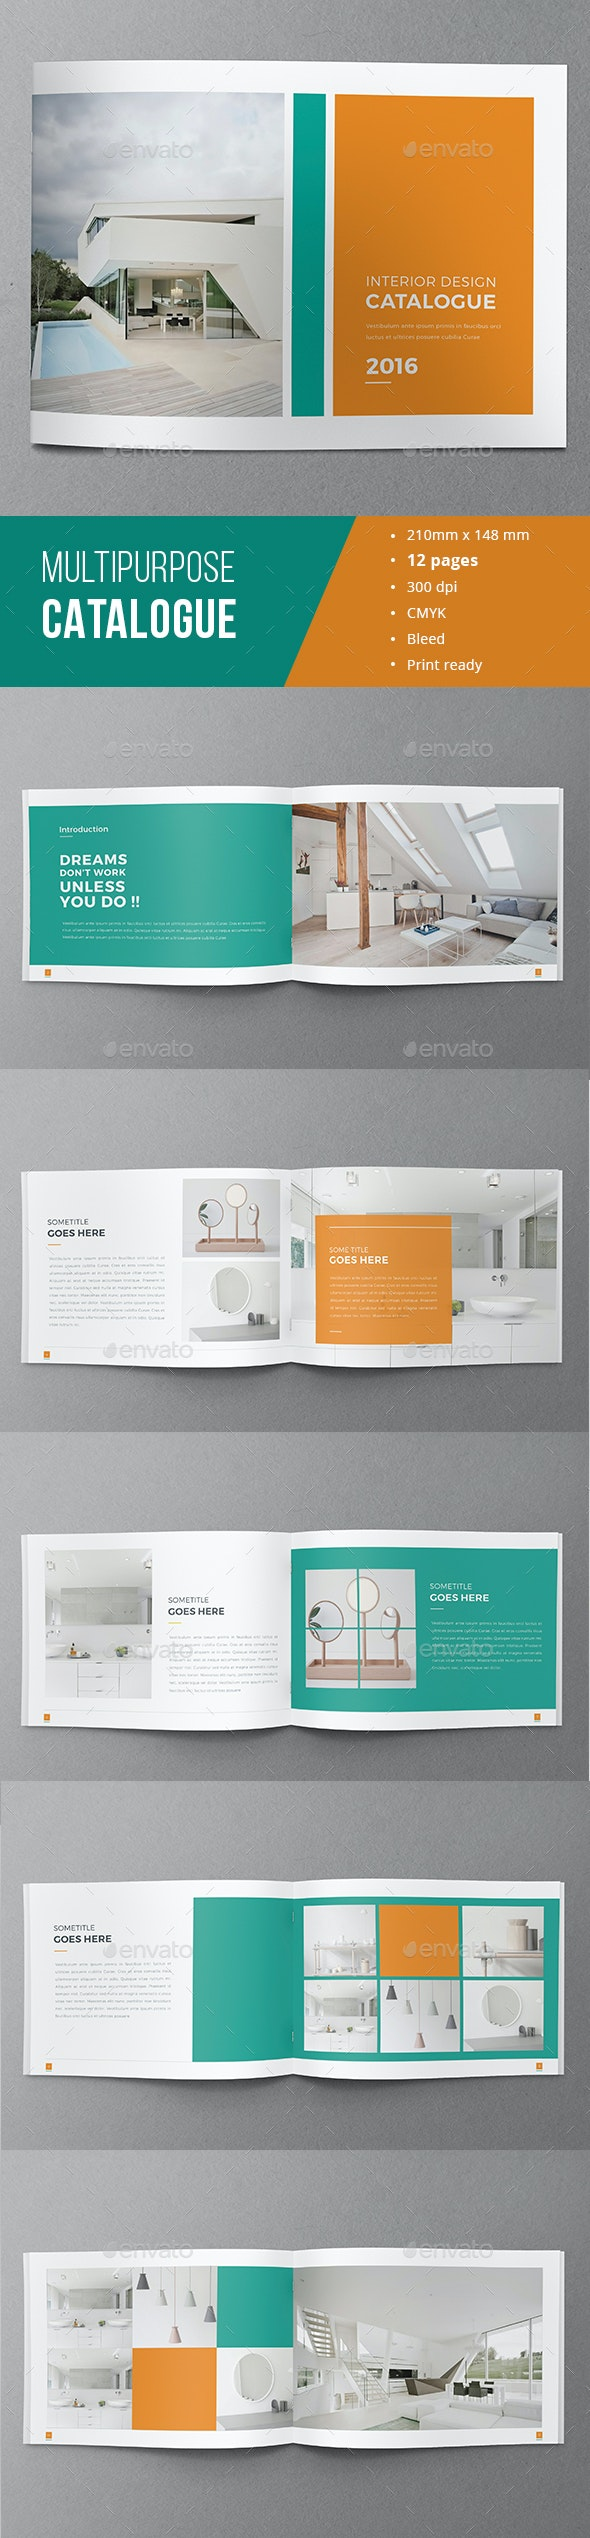 Minimal Catalogue Brochure 02  - Catalogs Brochures